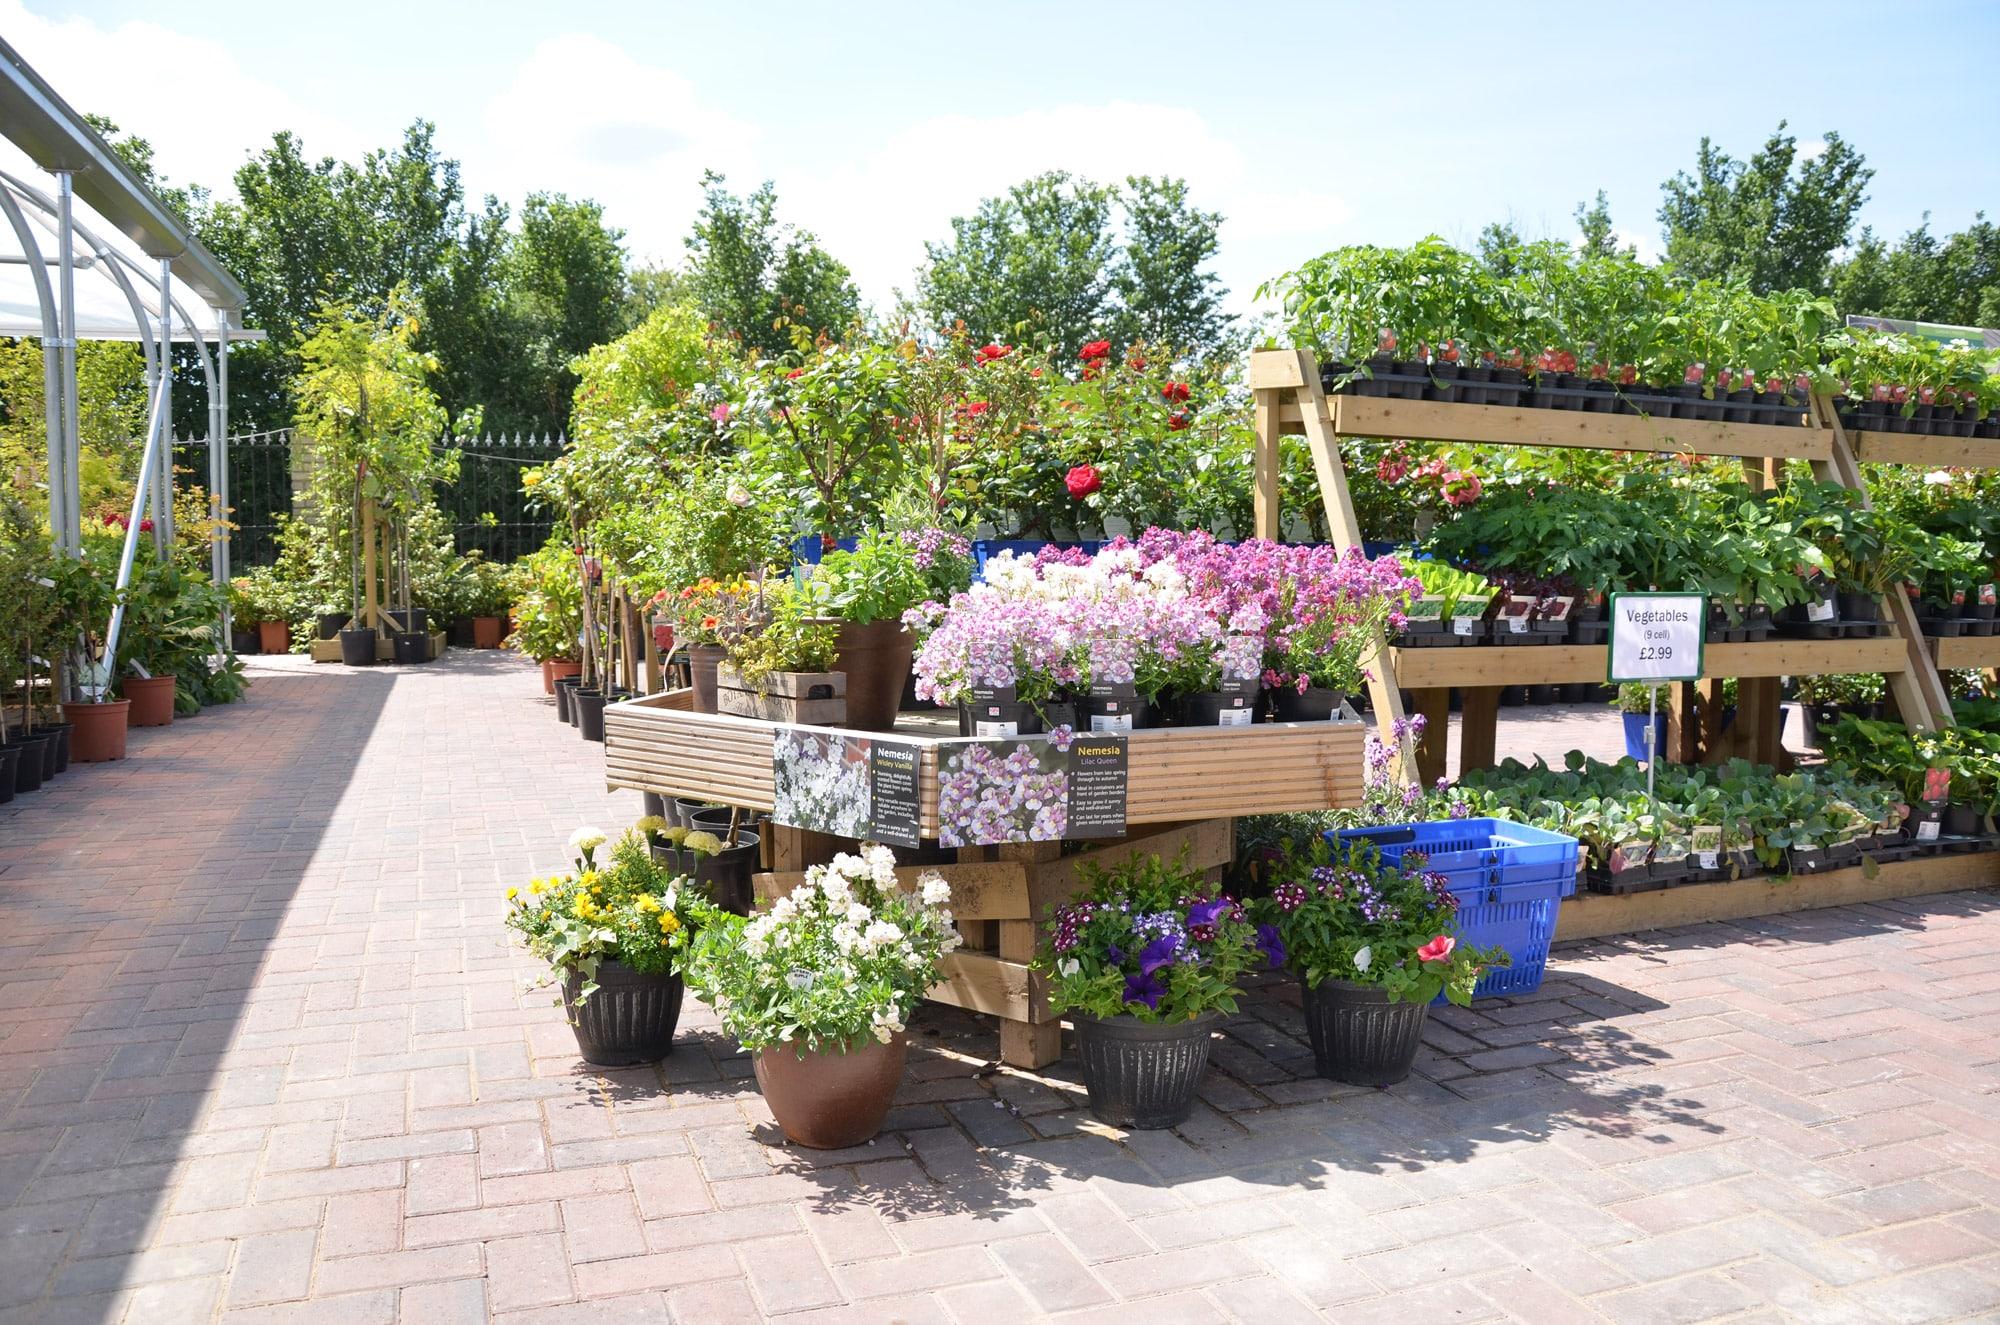 Lower-barn-gardencentre-displayflowers-min.jpg